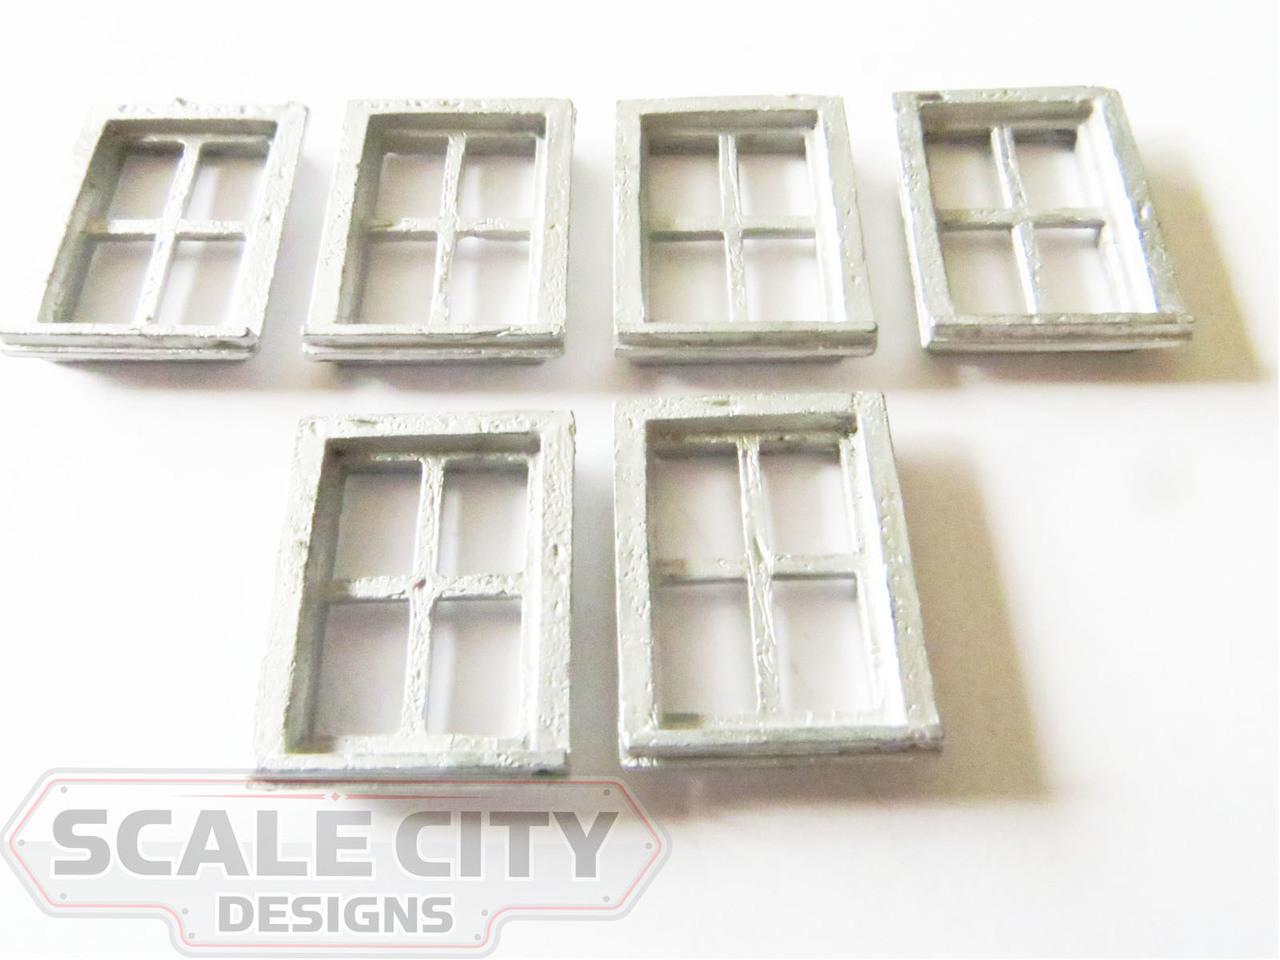 48-411 Caboose Bay Window Wood Style O Scale FKA Keil Line